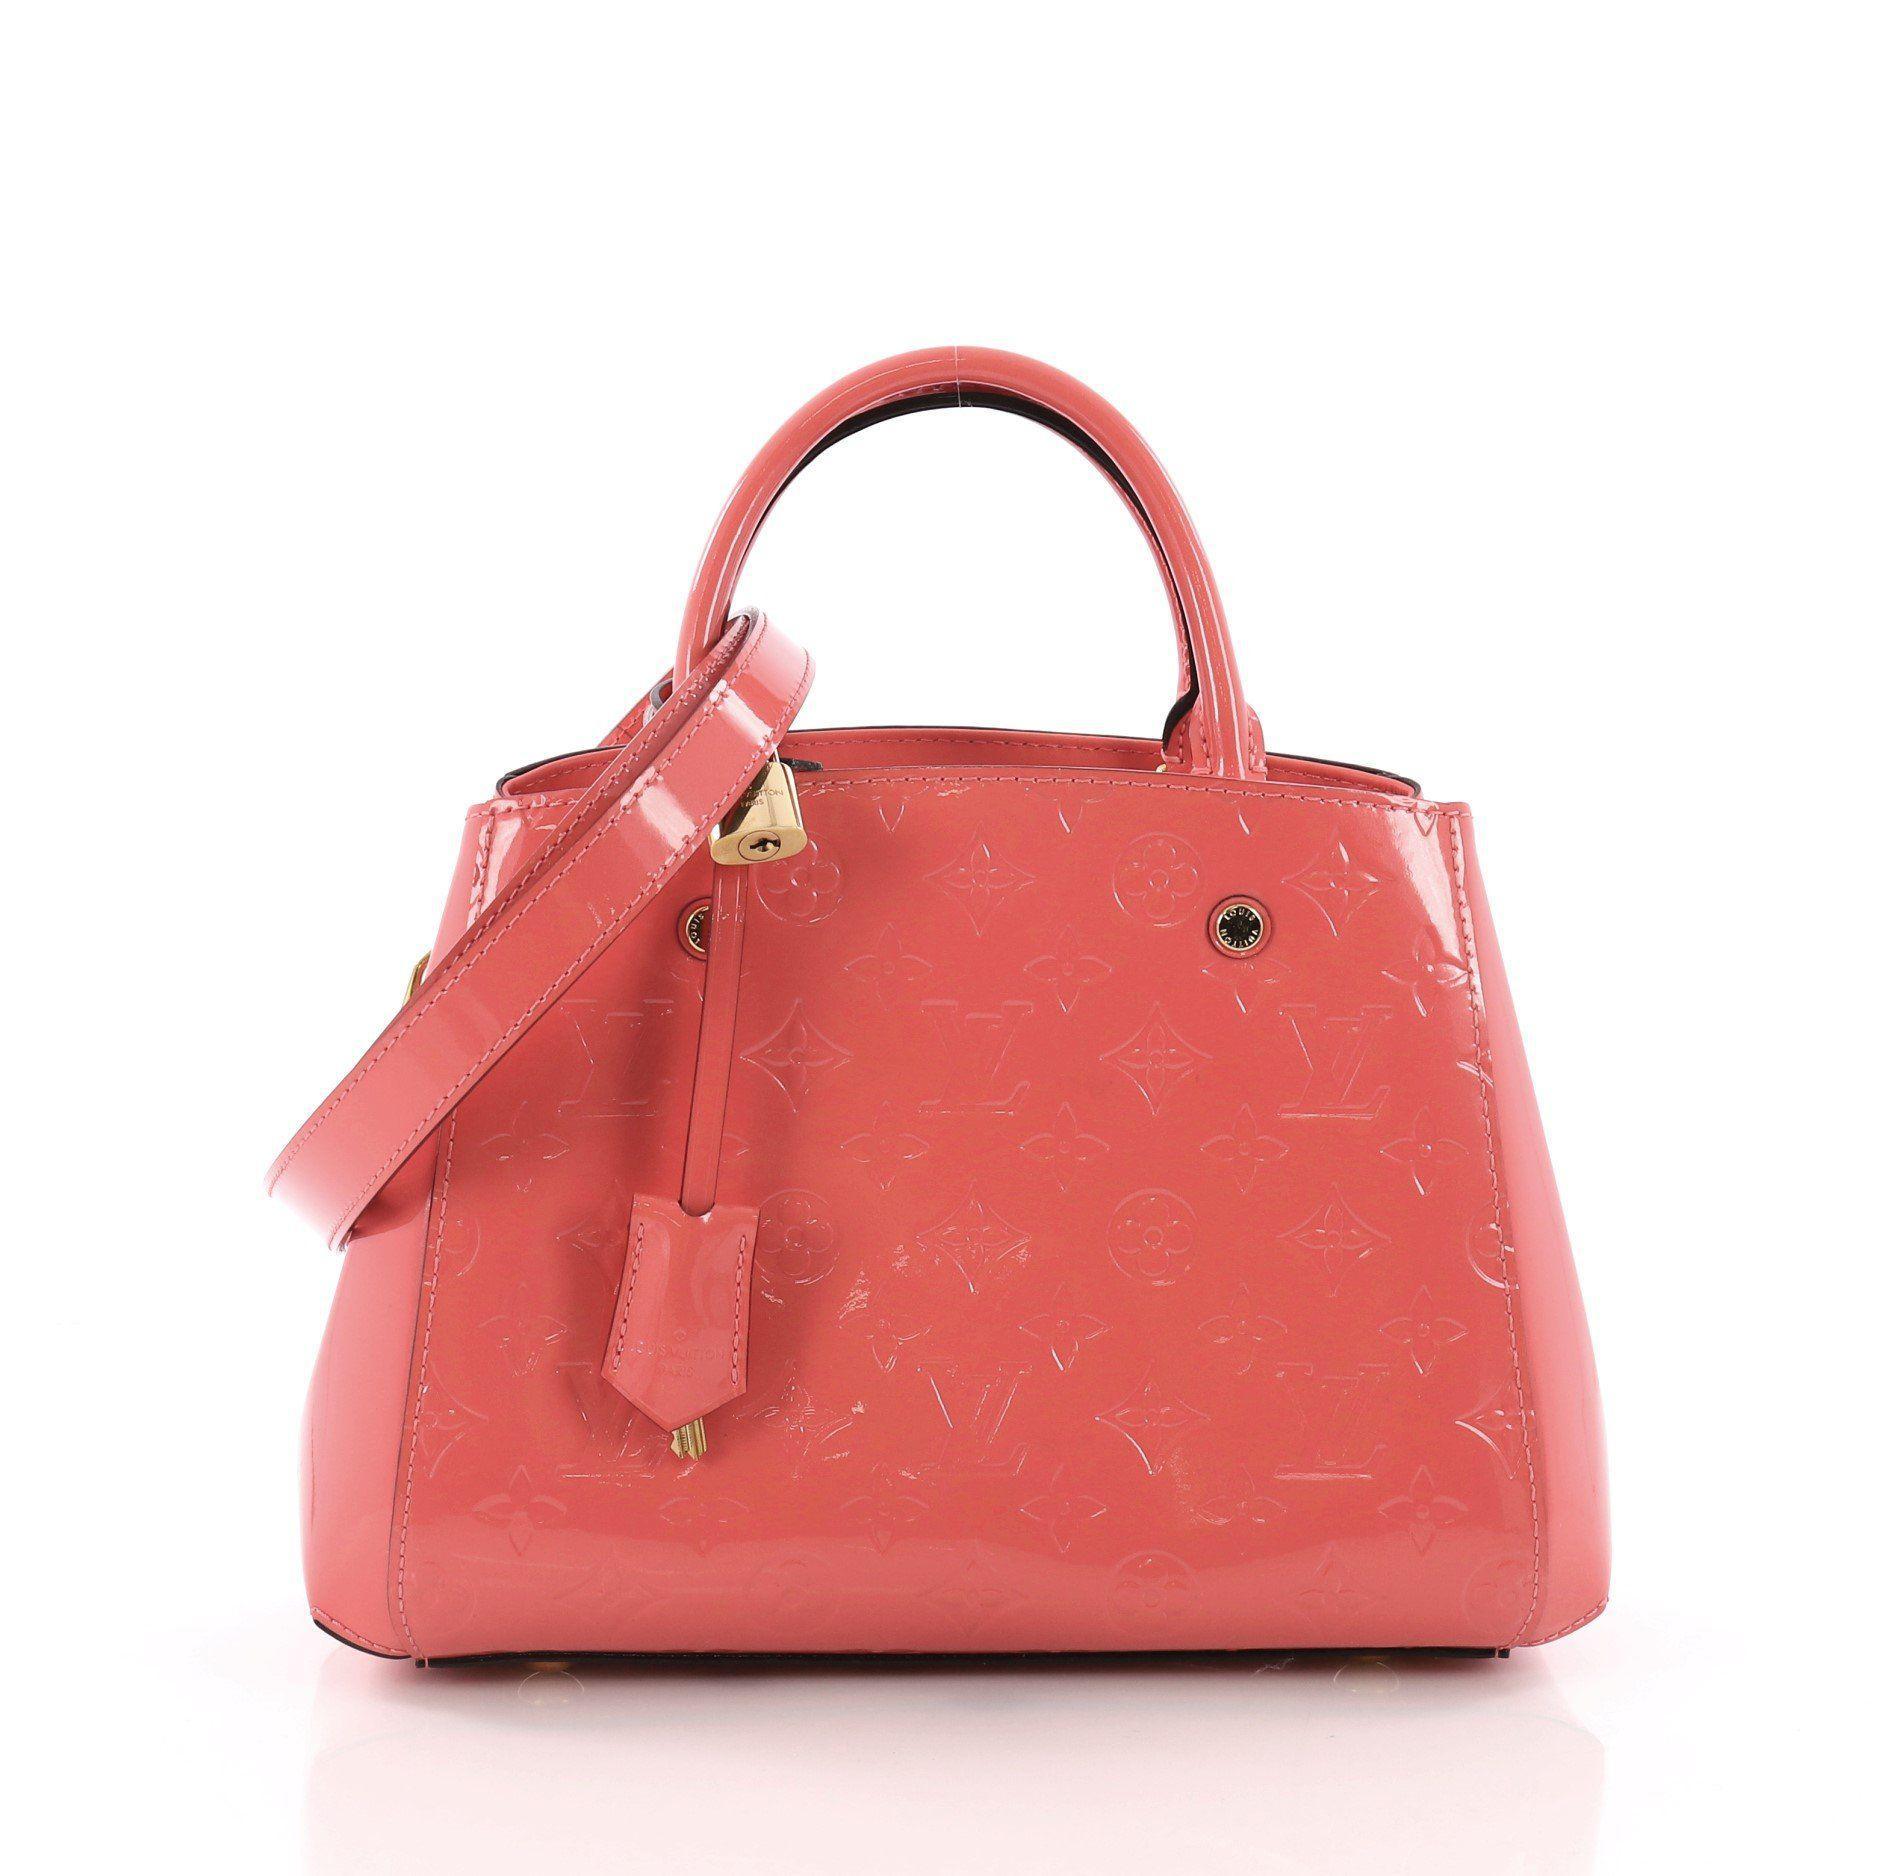 8f6b4006578 Louis Vuitton. Women s Red Pre Owned Montaigne Handbag Monogram Vernis Bb